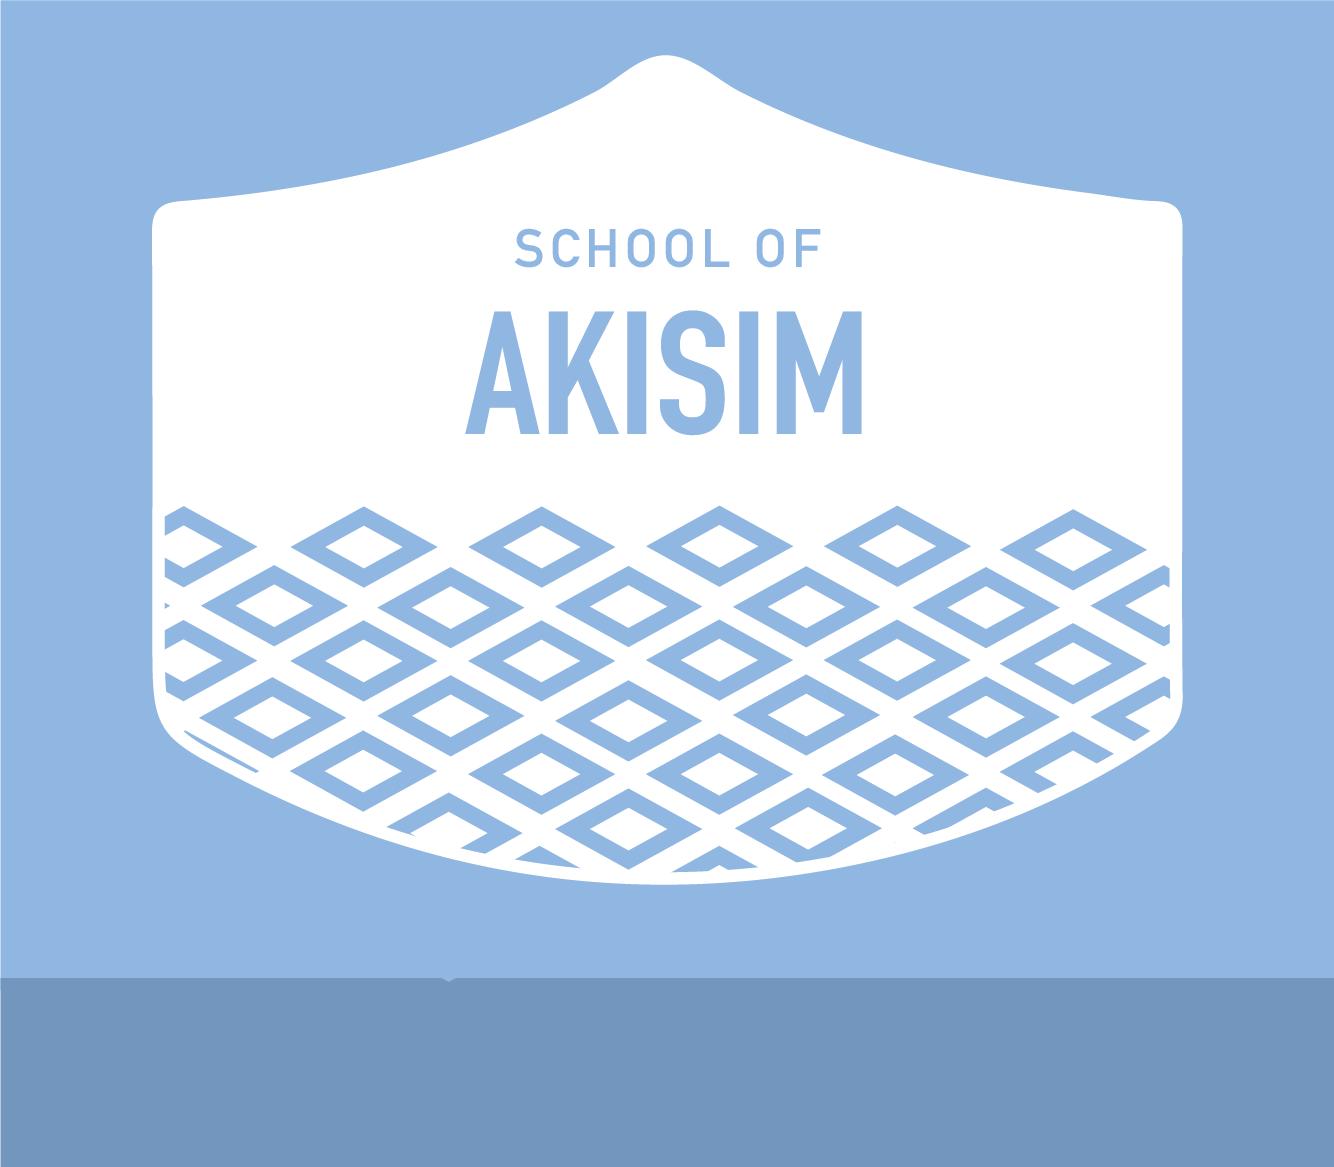 School of akisim